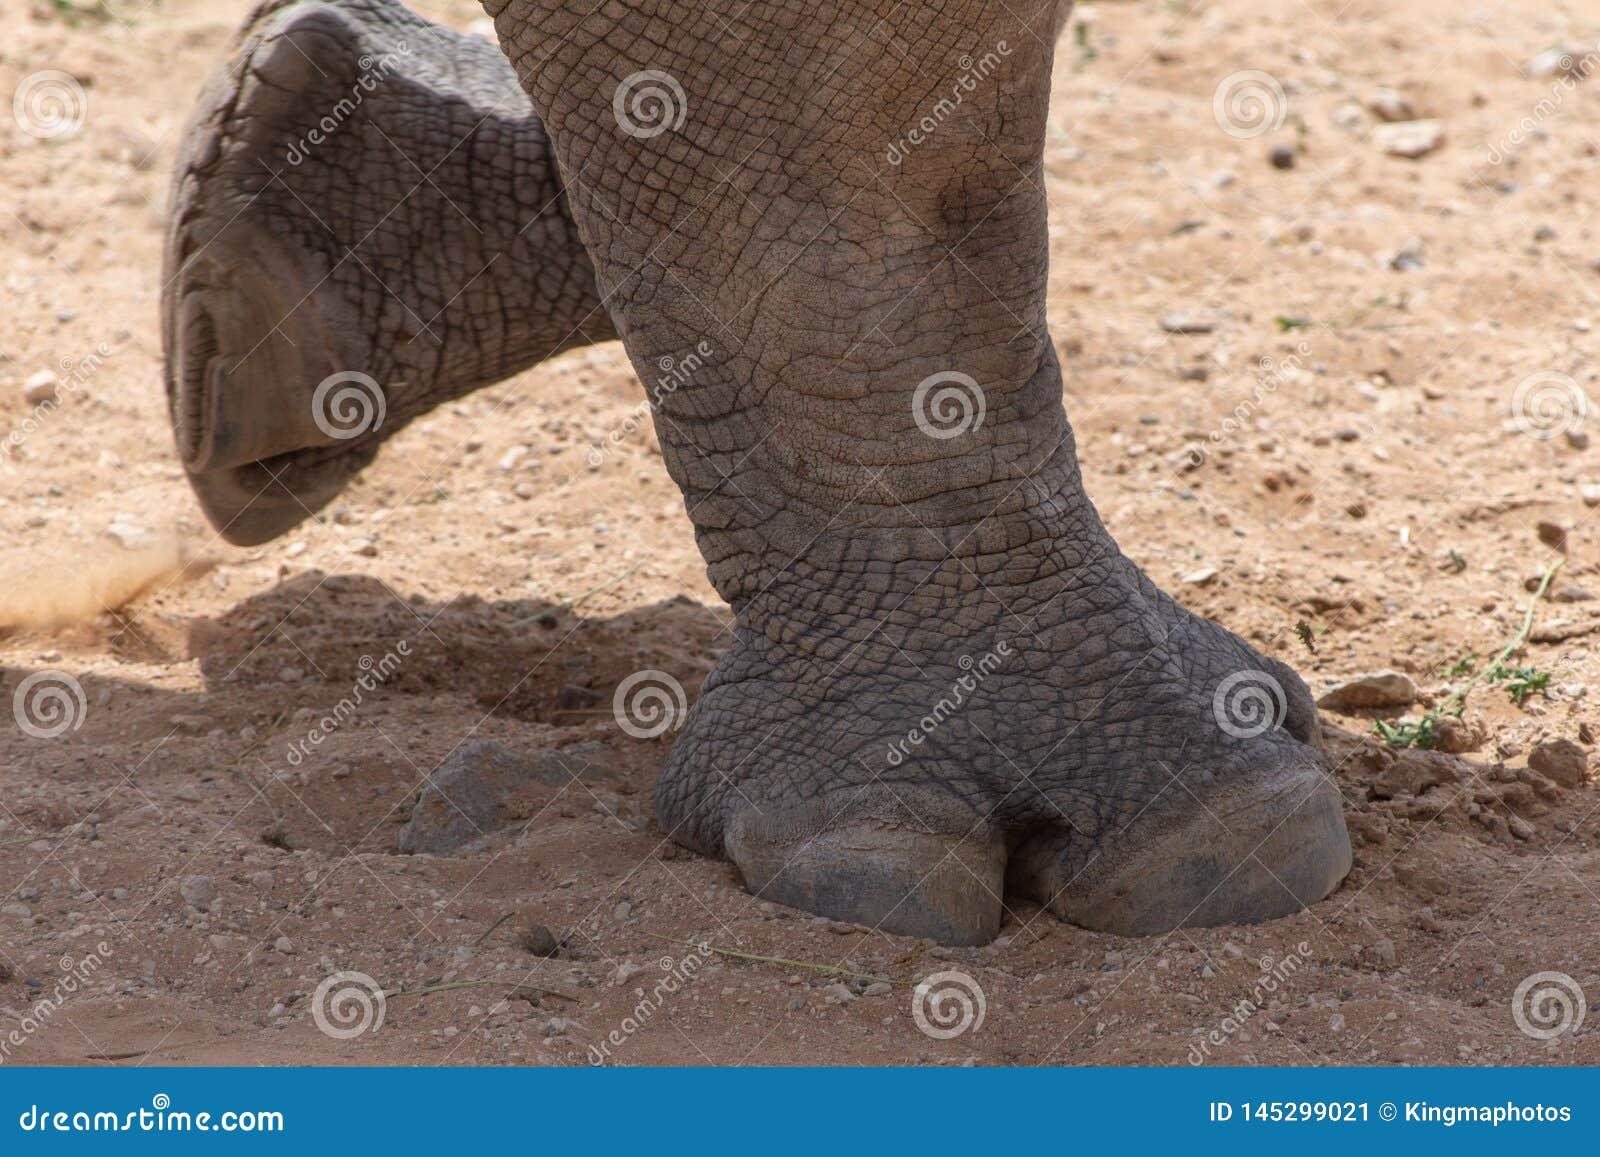 A white rhinoceros or square-lipped rhinoceros Ceratotherium simum feet moving across the dirt